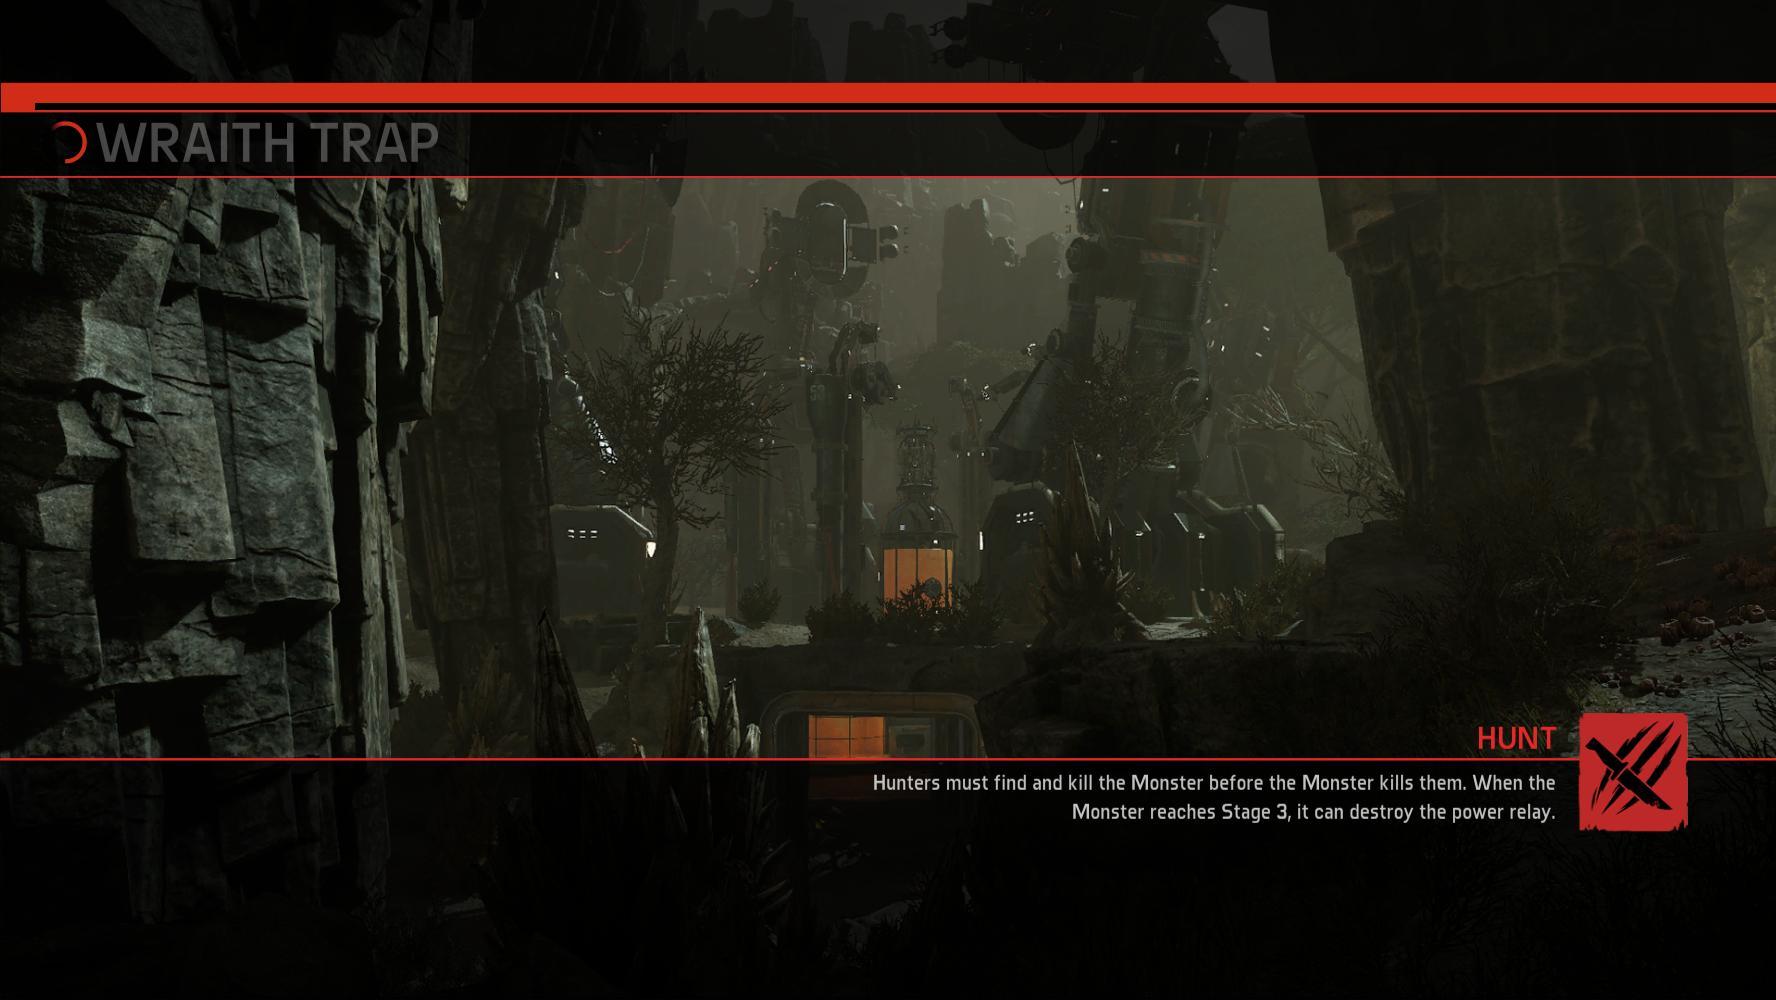 Image Wraith Trap Screens 1jpg Evolve Wiki FANDOM Powered - Power Relay Evolve